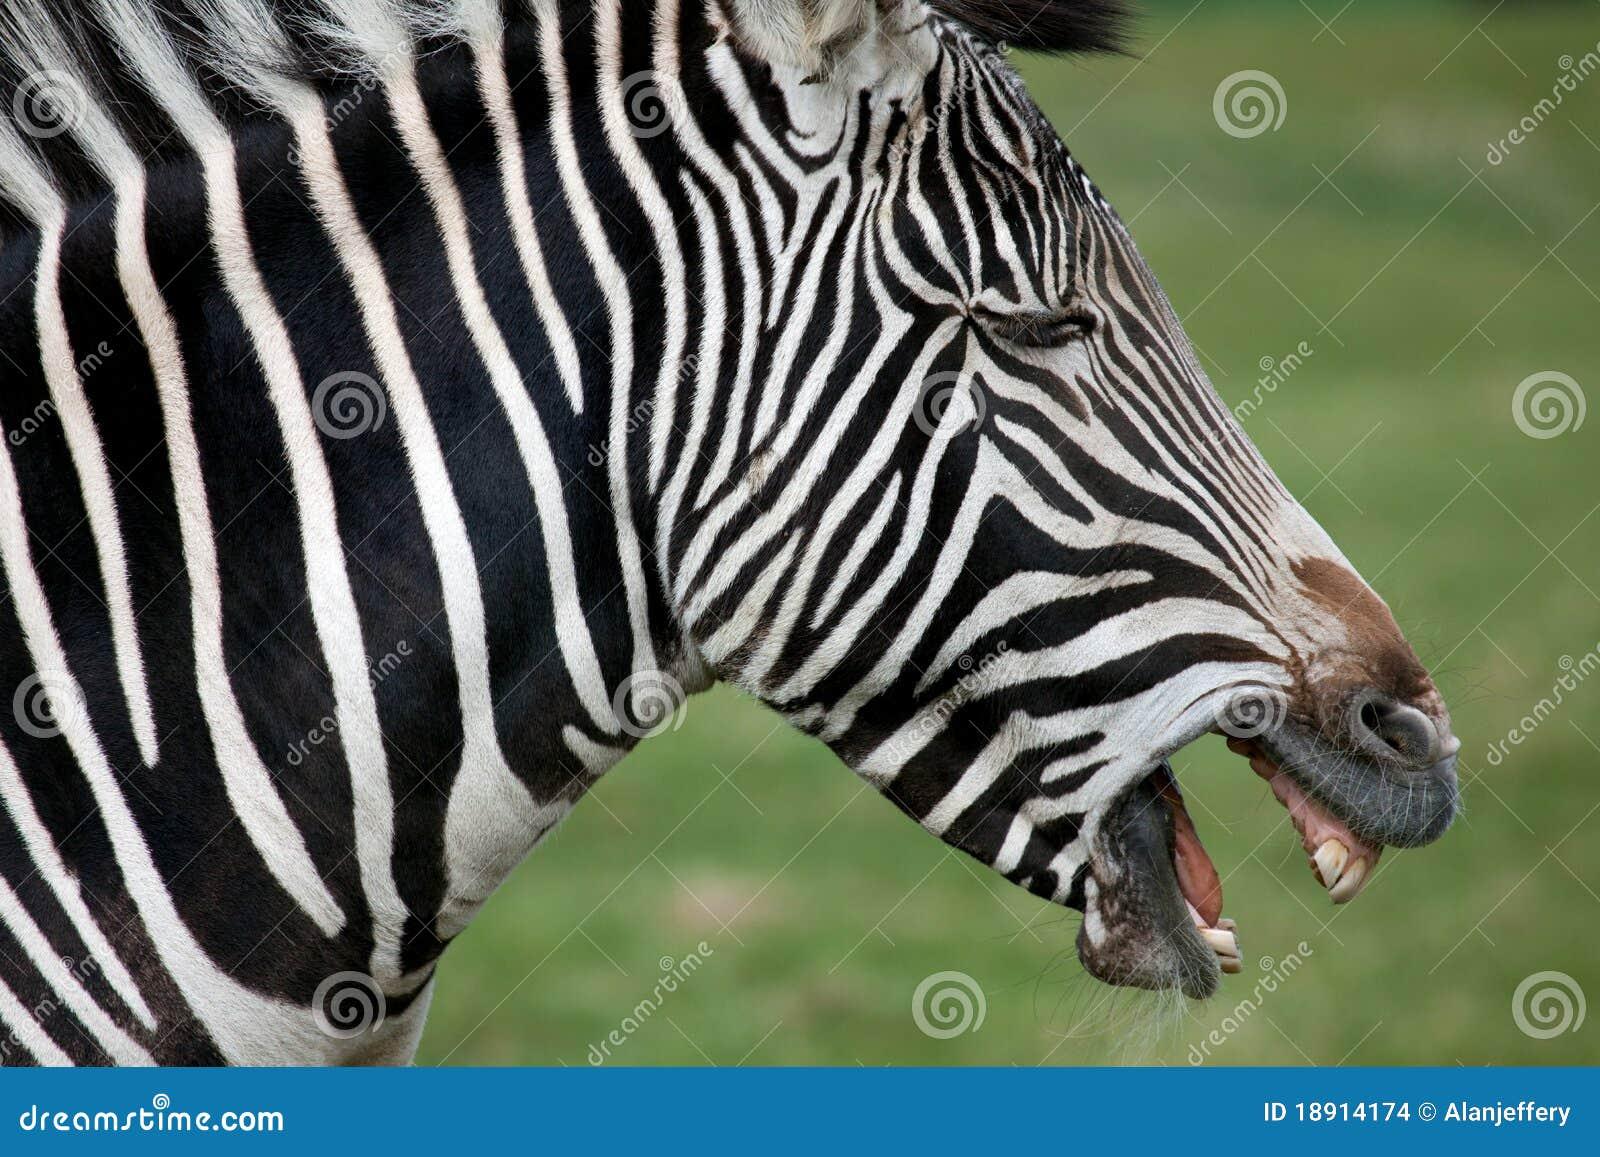 Zebra Profile Drawing ...